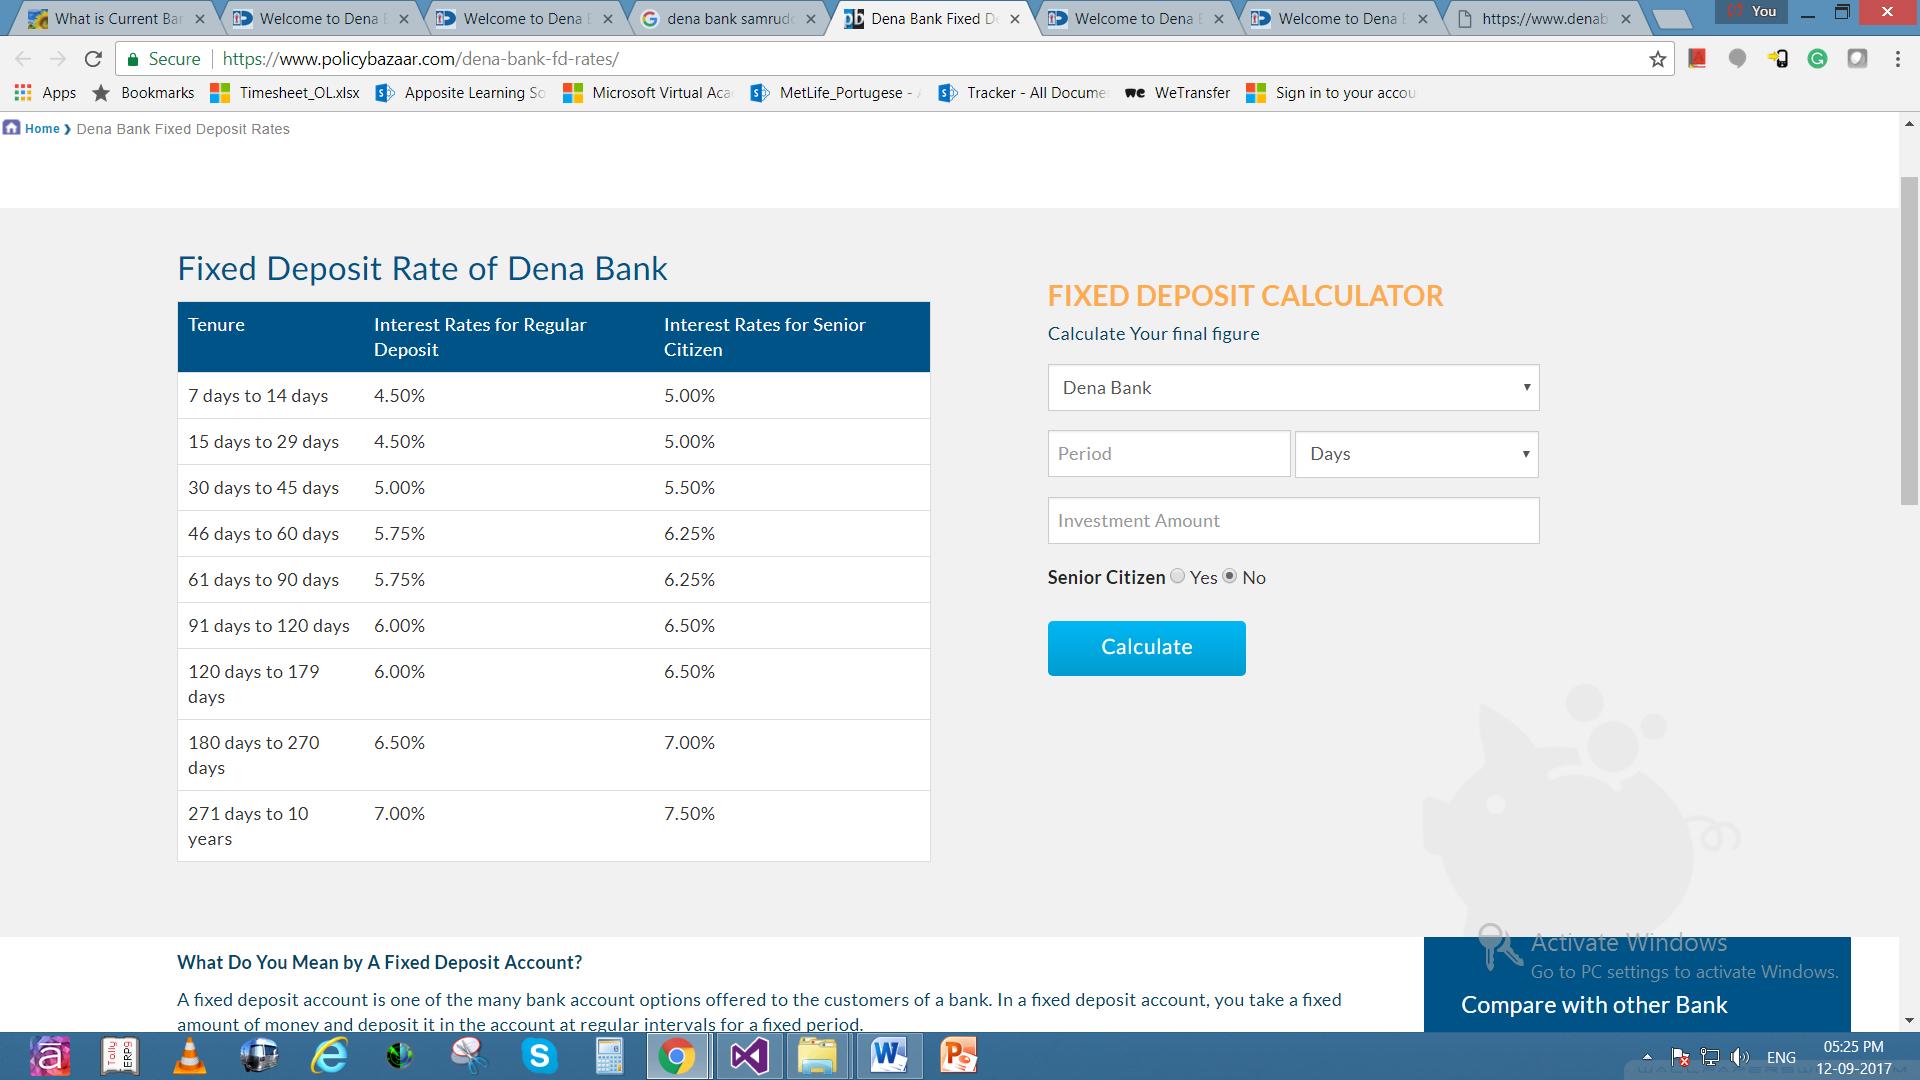 Dena bank fixed deposit account